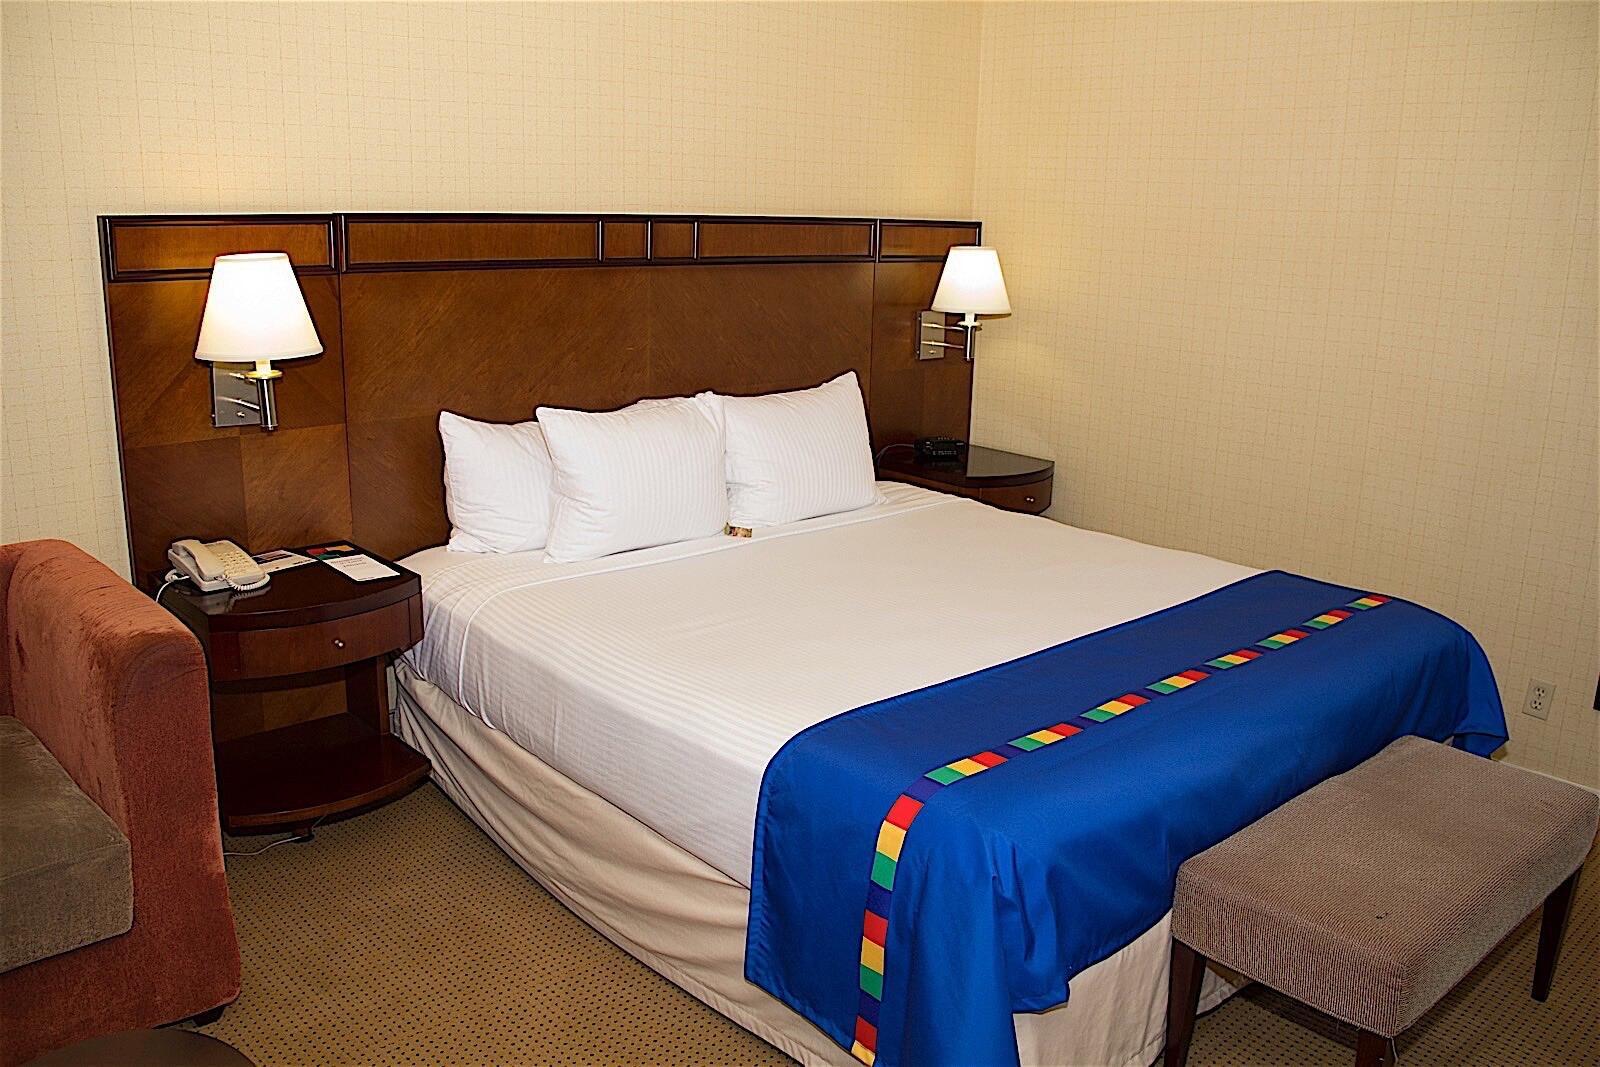 Standard King Bed